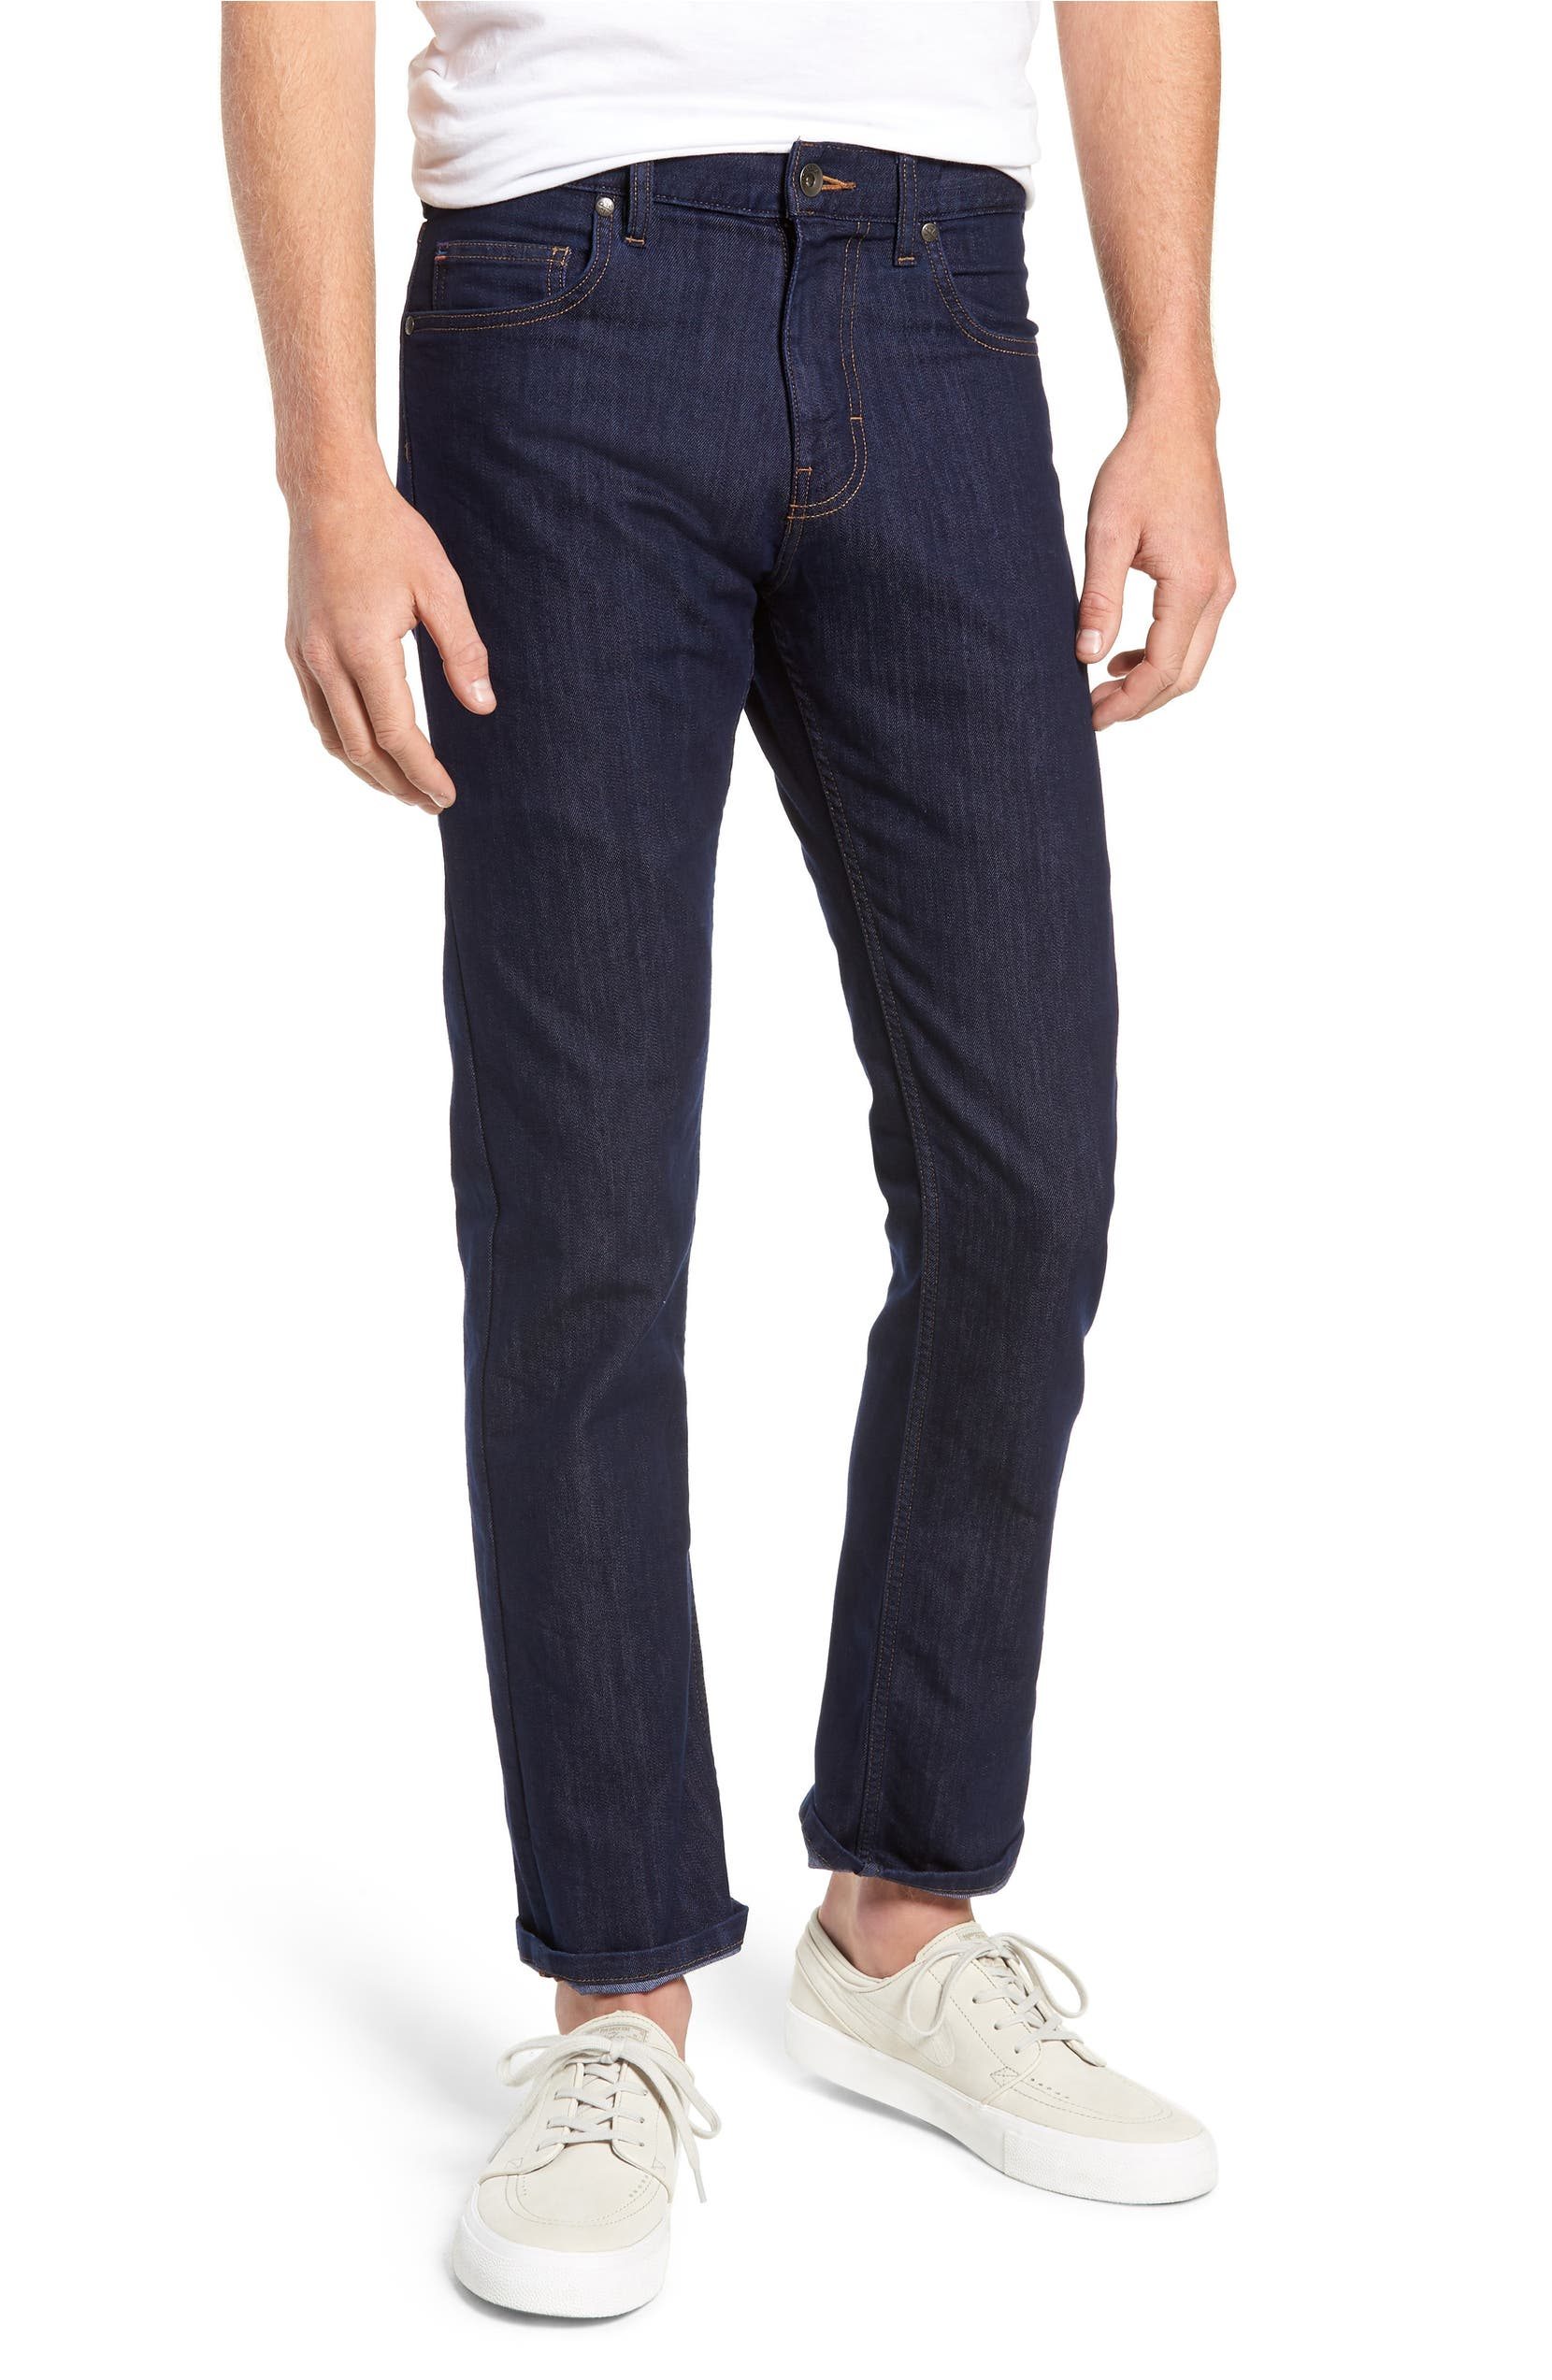 new style 11365 c53b0 Straight Leg Performance Jeans